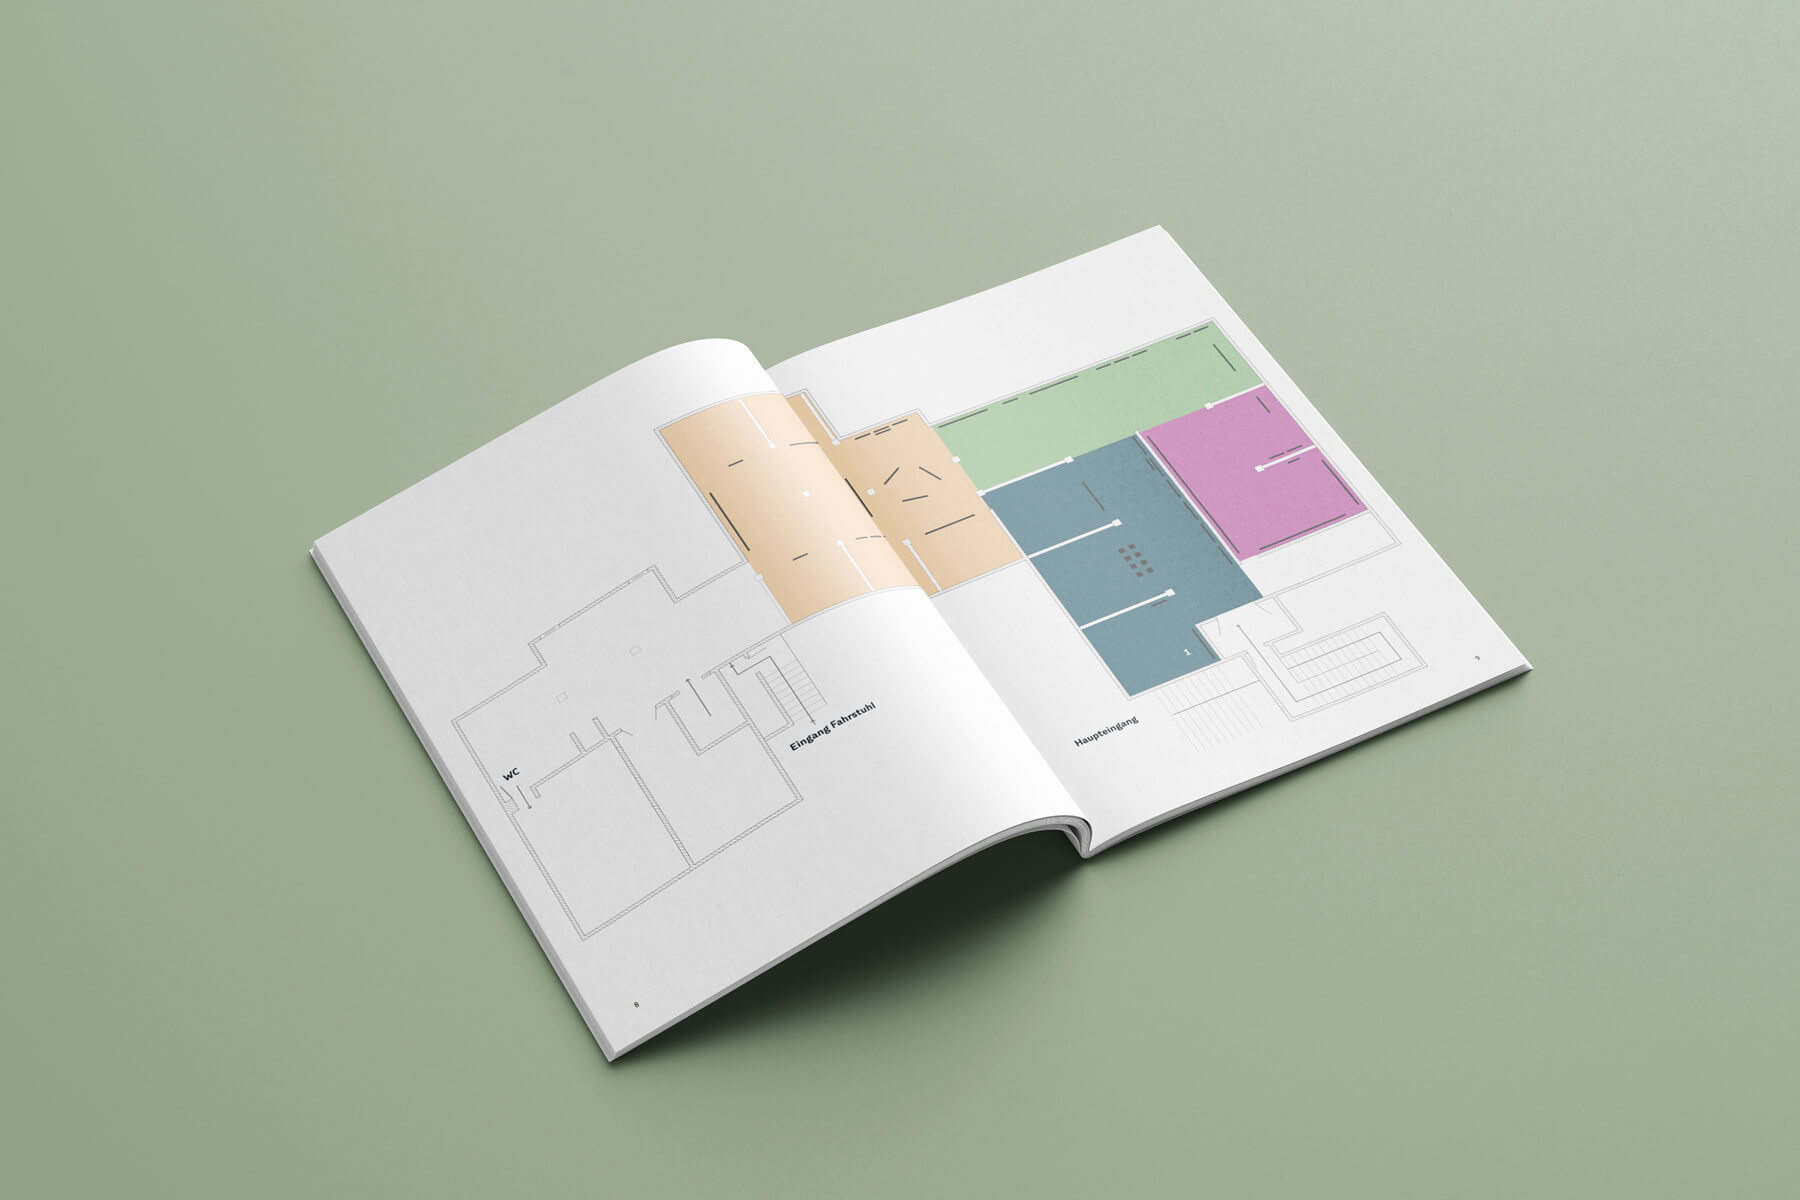 grafikdesign-janis-weidner-lindau-bodensee-katalog-03